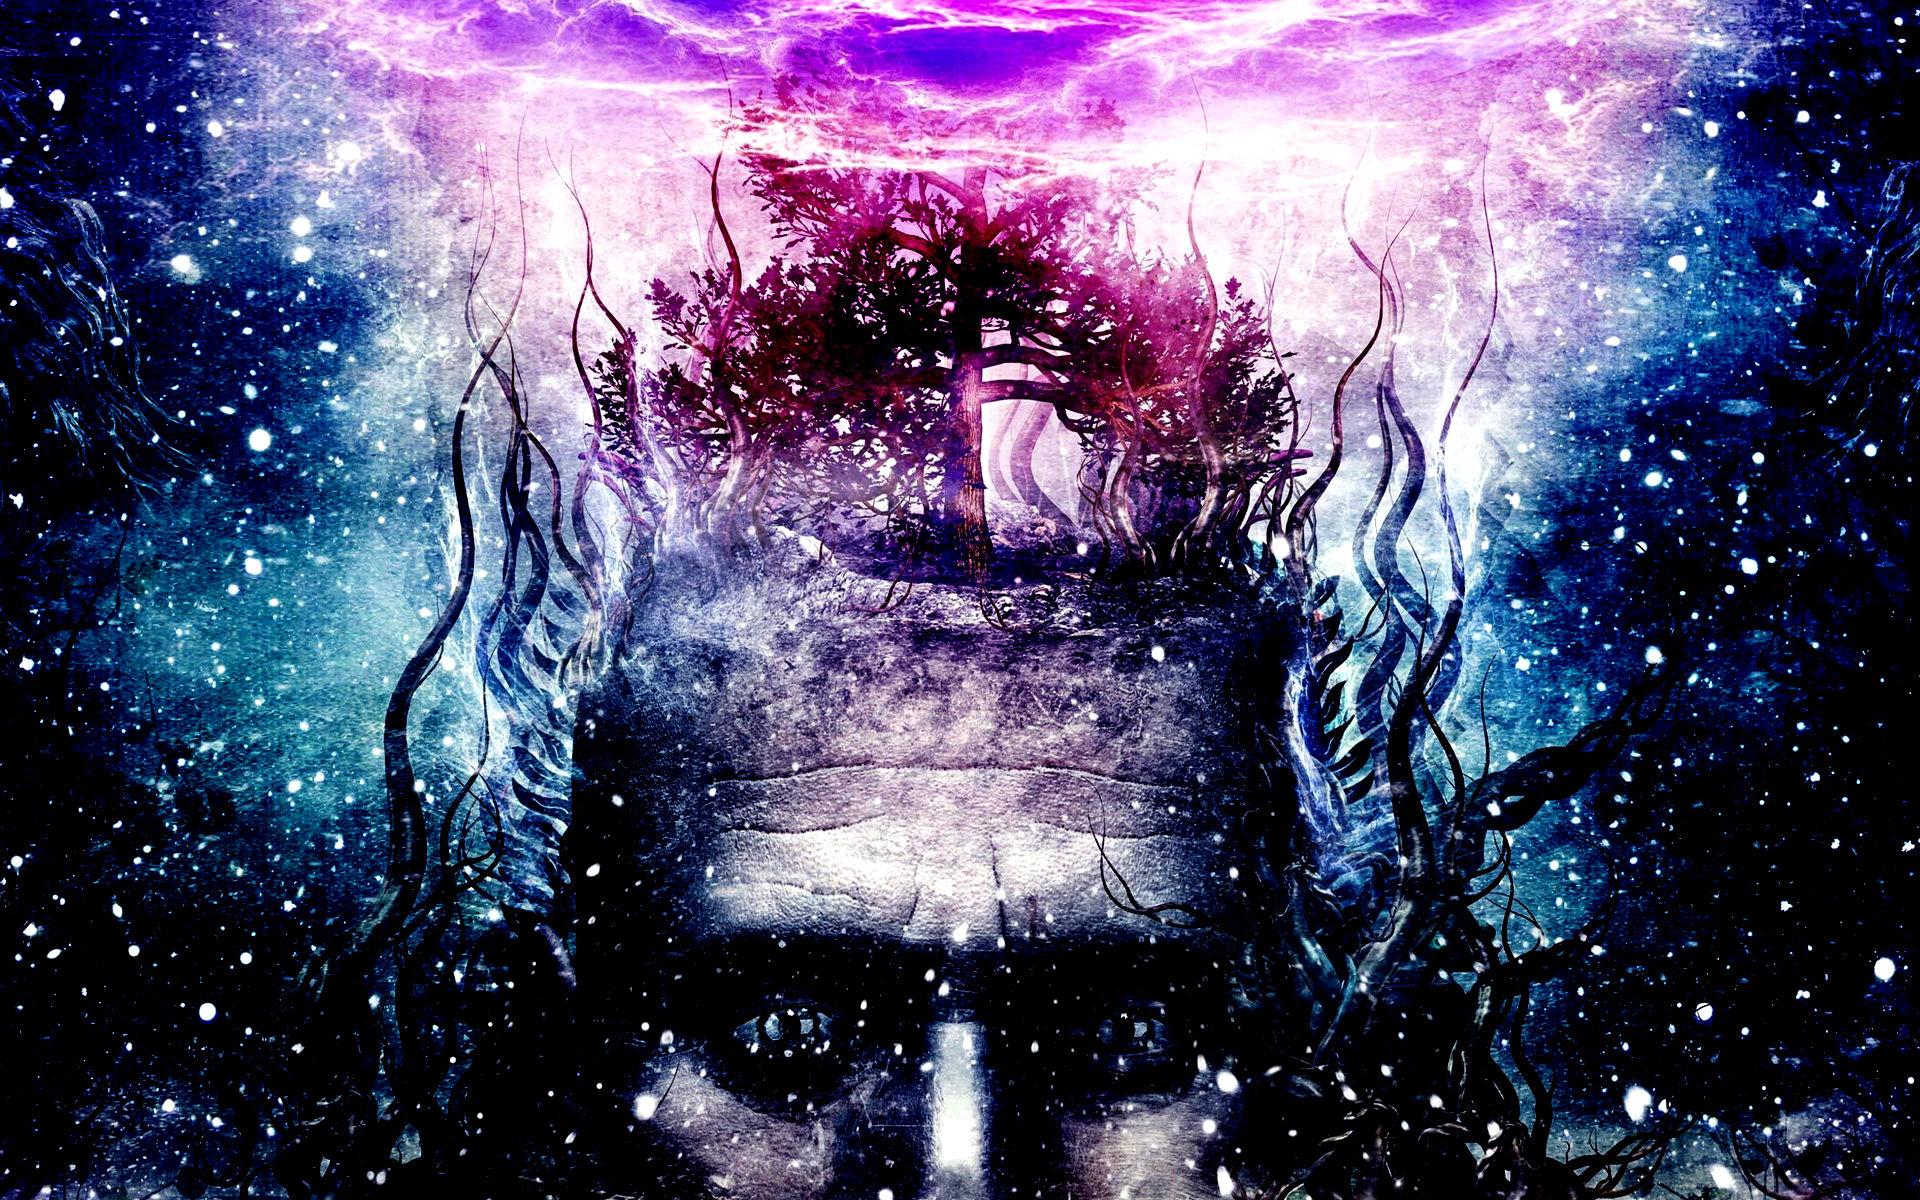 trippy galaxy wallpaper - photo #2